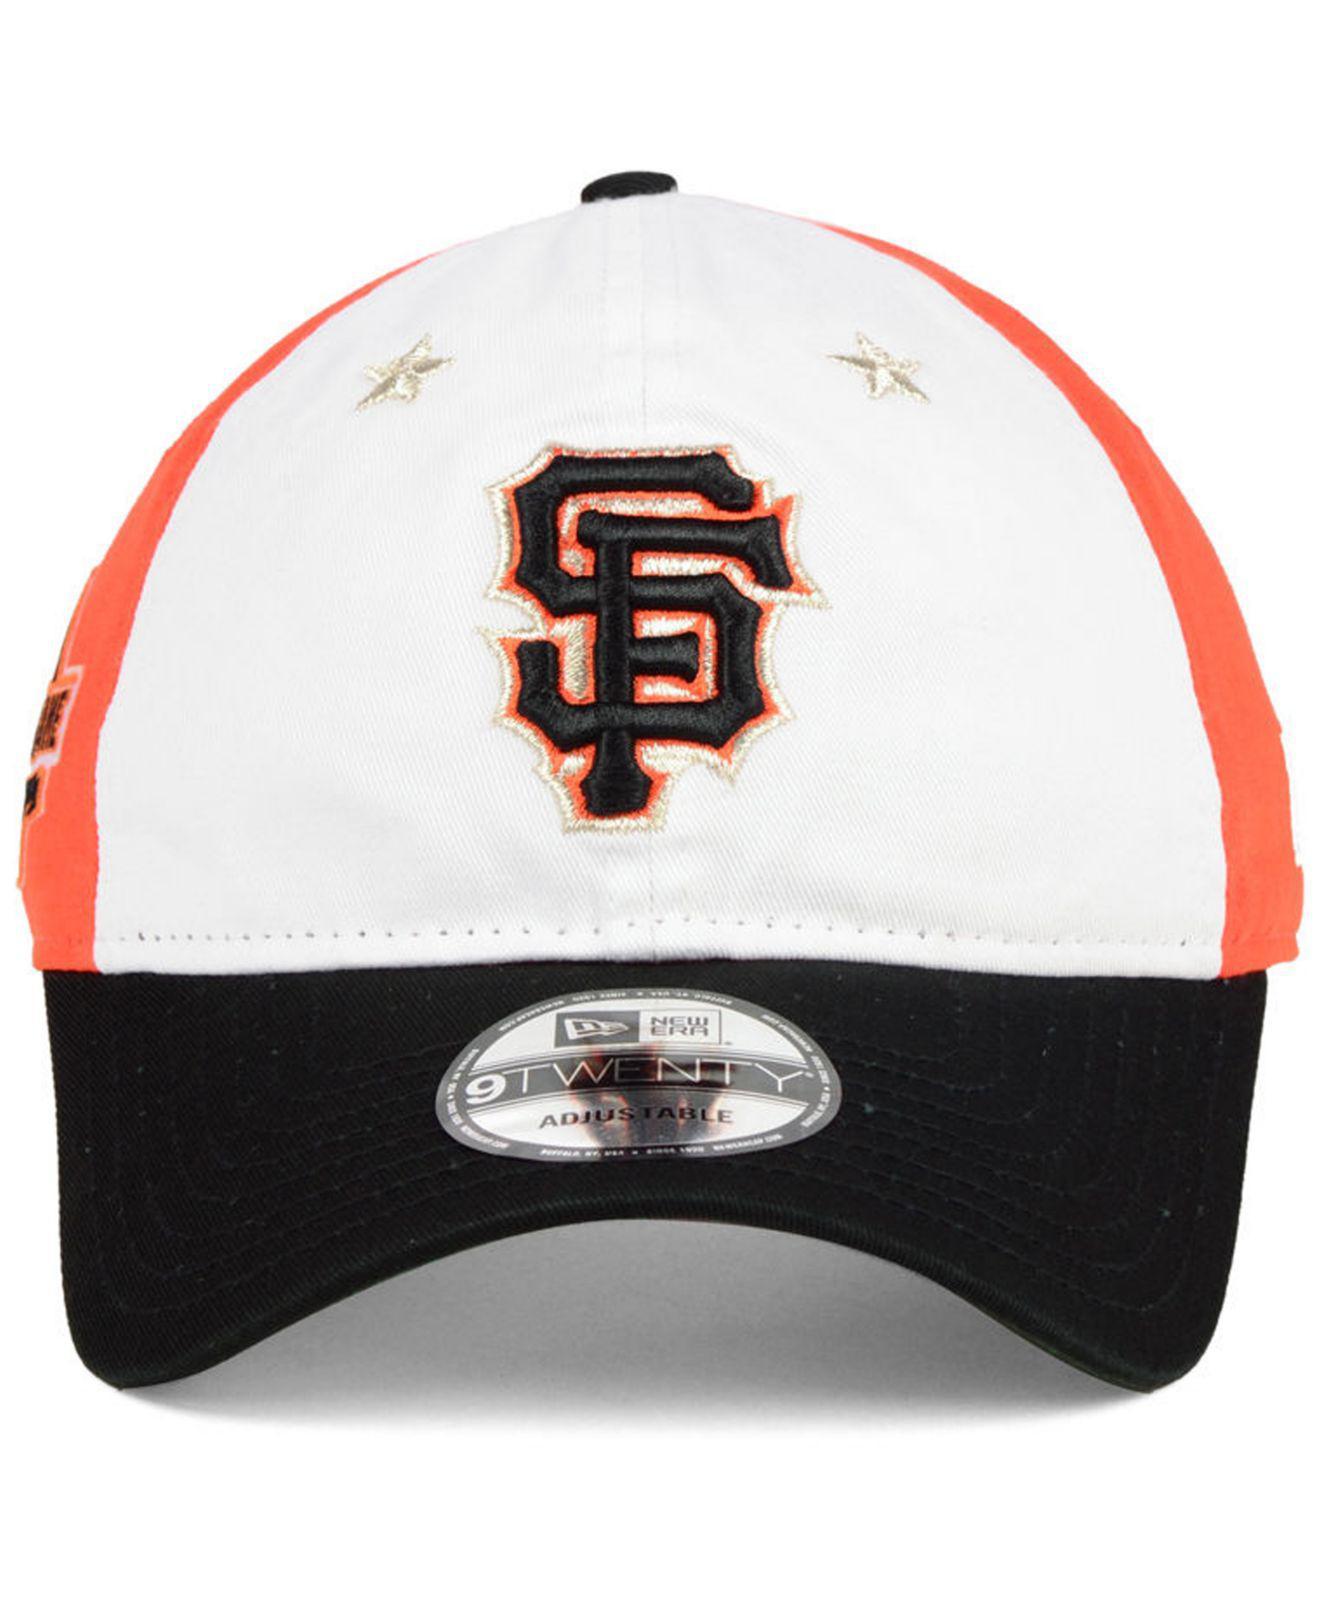 best sneakers 4c583 62957 ... new era 59fifty fitted cap hat 7 5 czech lyst ktz san francisco giants  all star game 9twenty strapback cap 2018 in black for ...